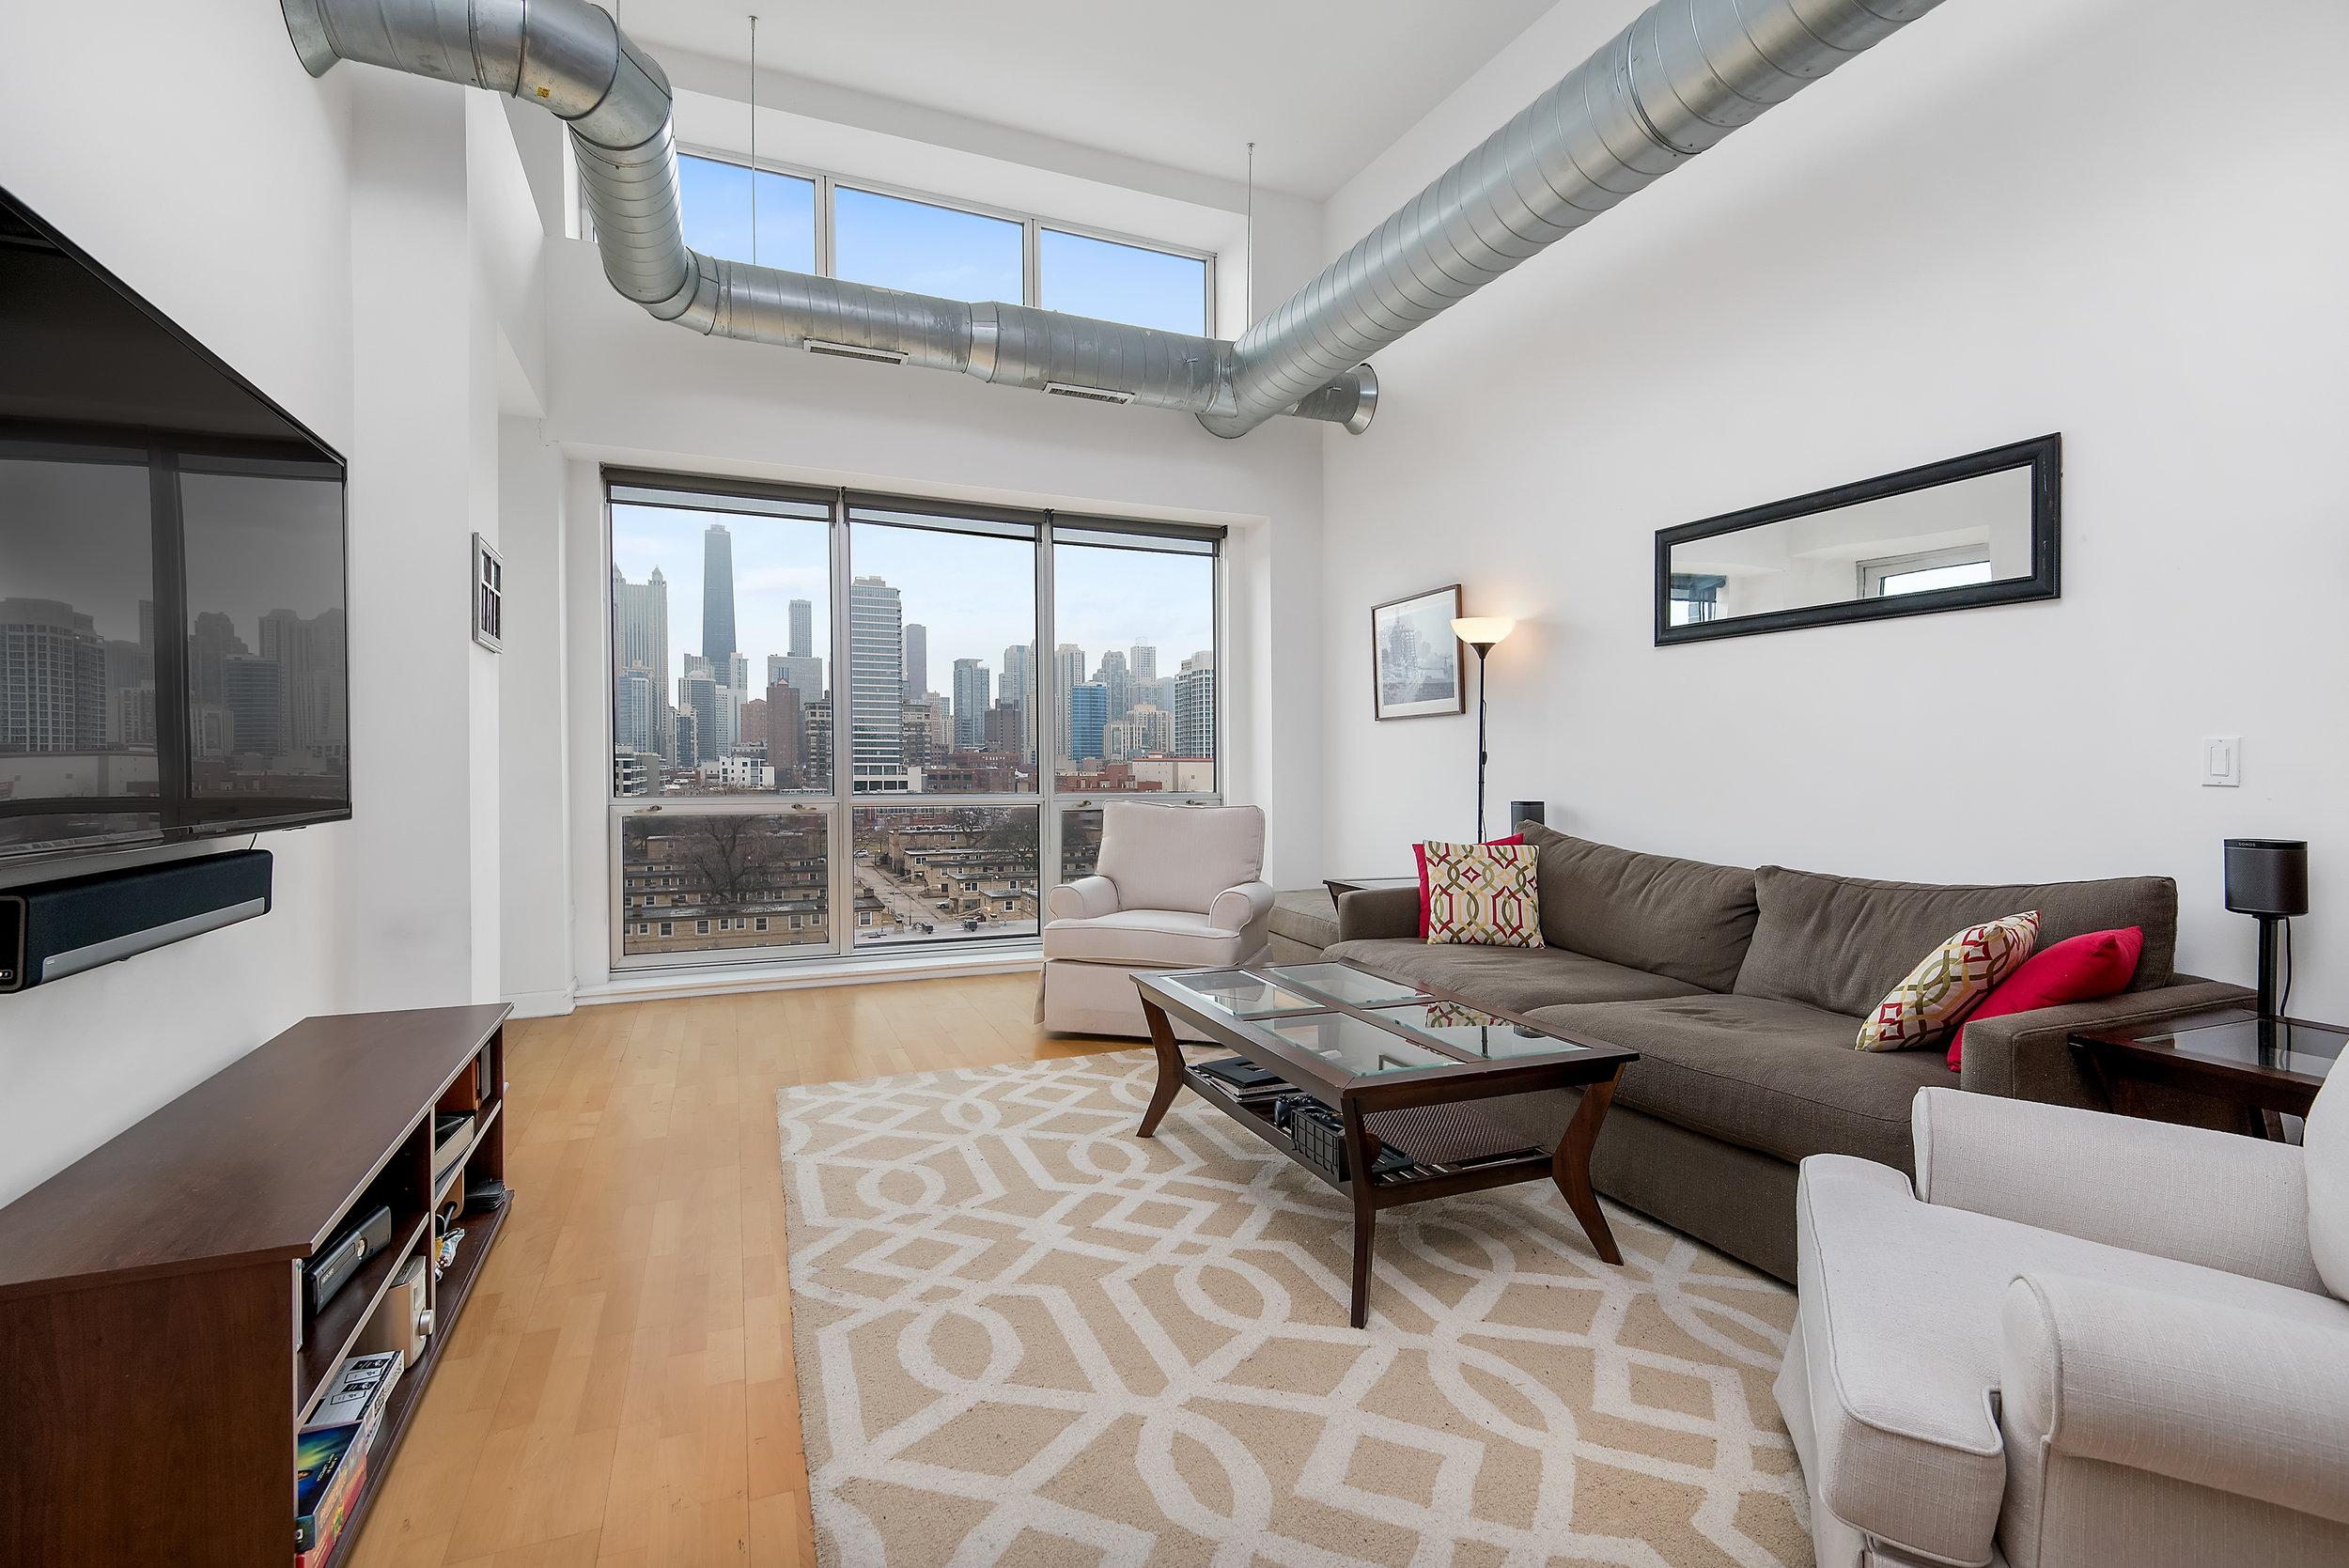 Bobby-Review-RJ -Yozwiak-Chicago-Real-Estate.jpg